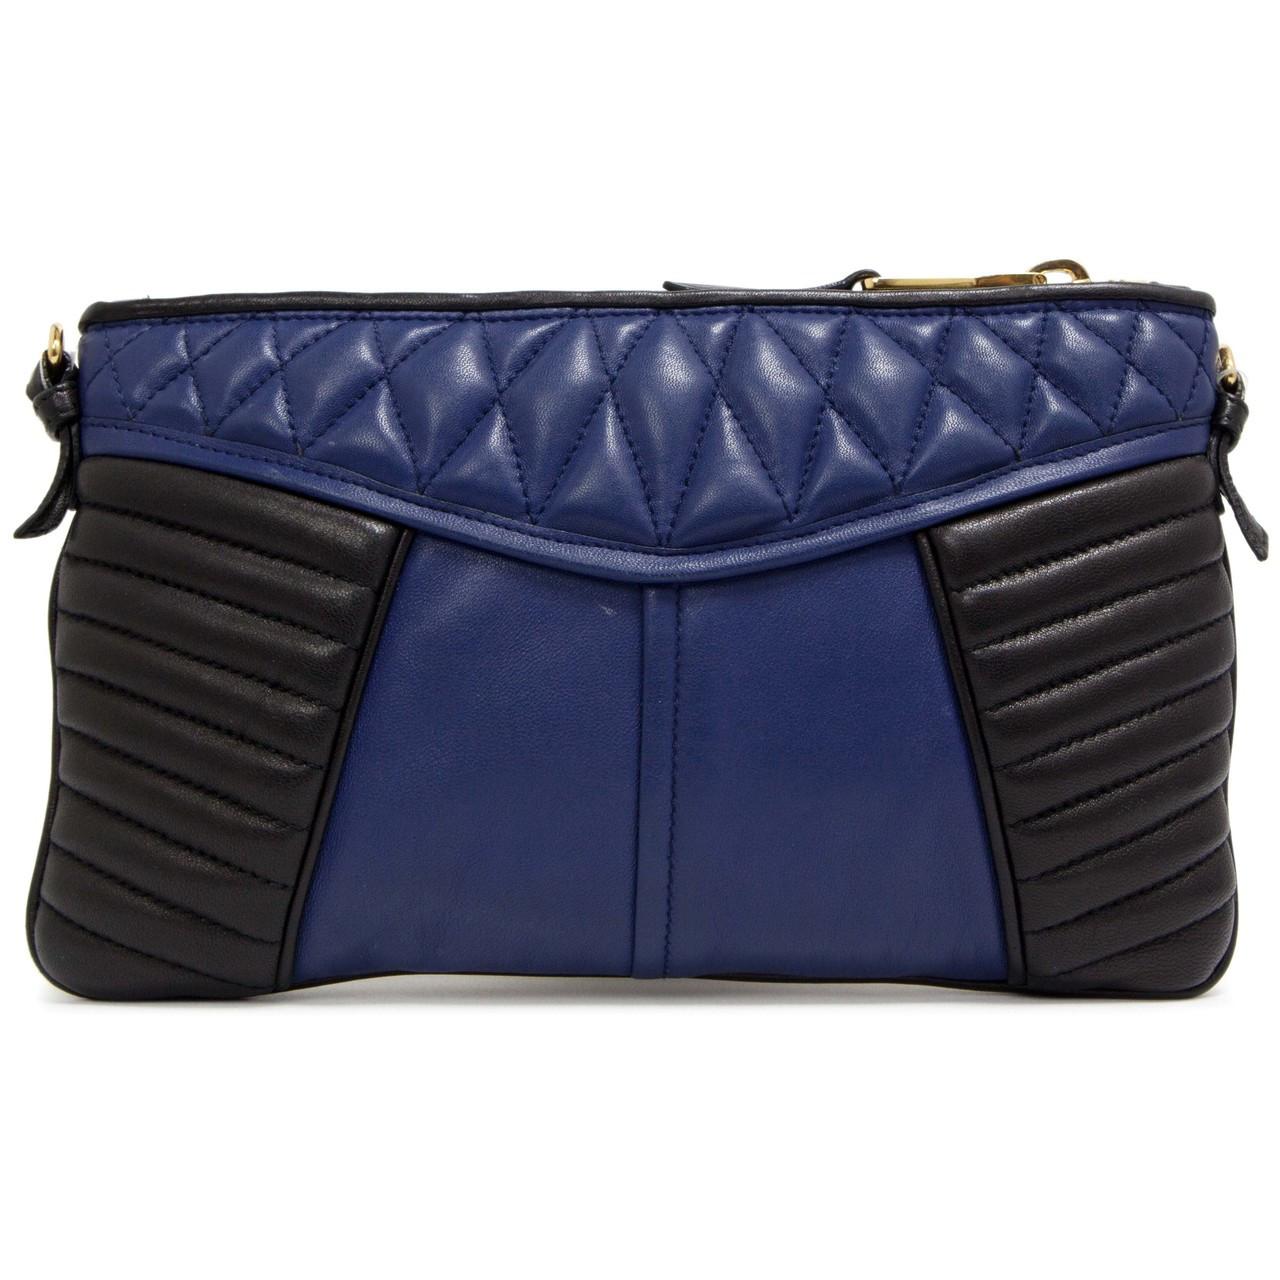 3b0243af75c0 Miu Miu Blue   Black Quilted Nappa Clutch - modaselle